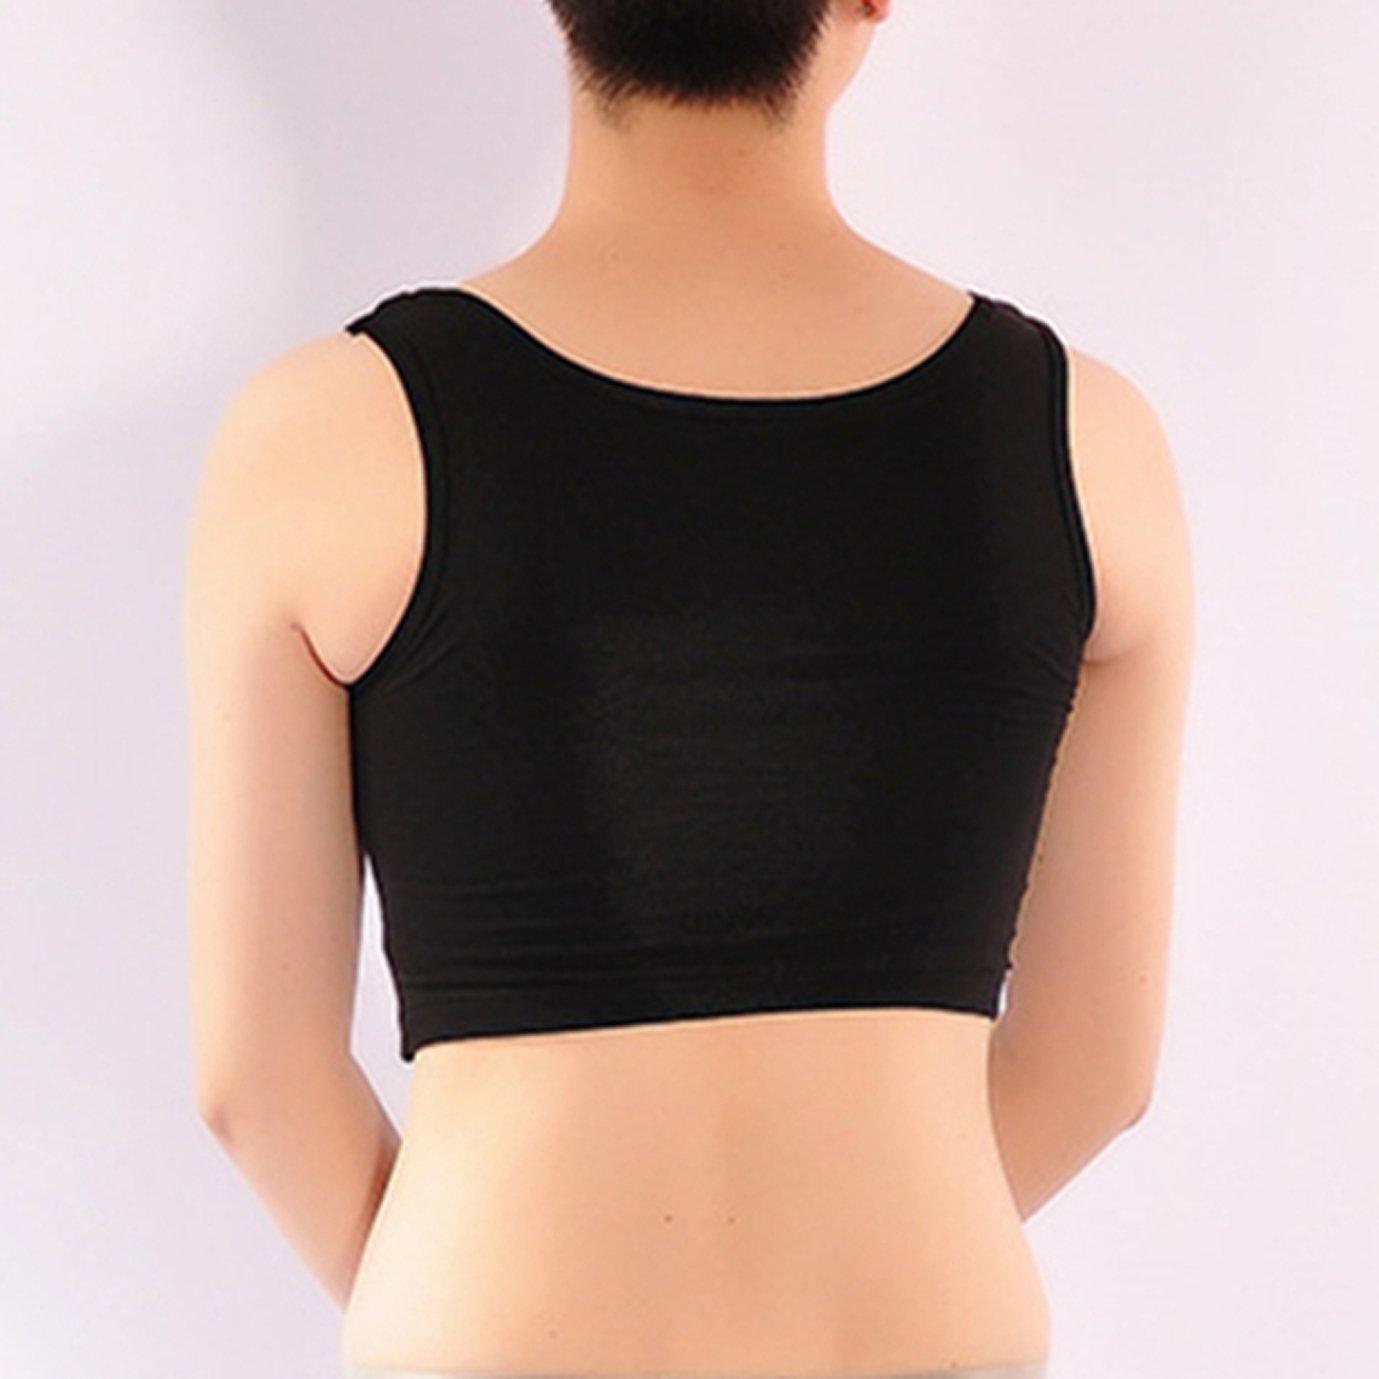 c35058660f33a BaronHong Women Lesbian Tomboy Underwear Cotton Tank Top Vest Chest Binder  Stronger Bandage  Amazon.co.uk  Clothing